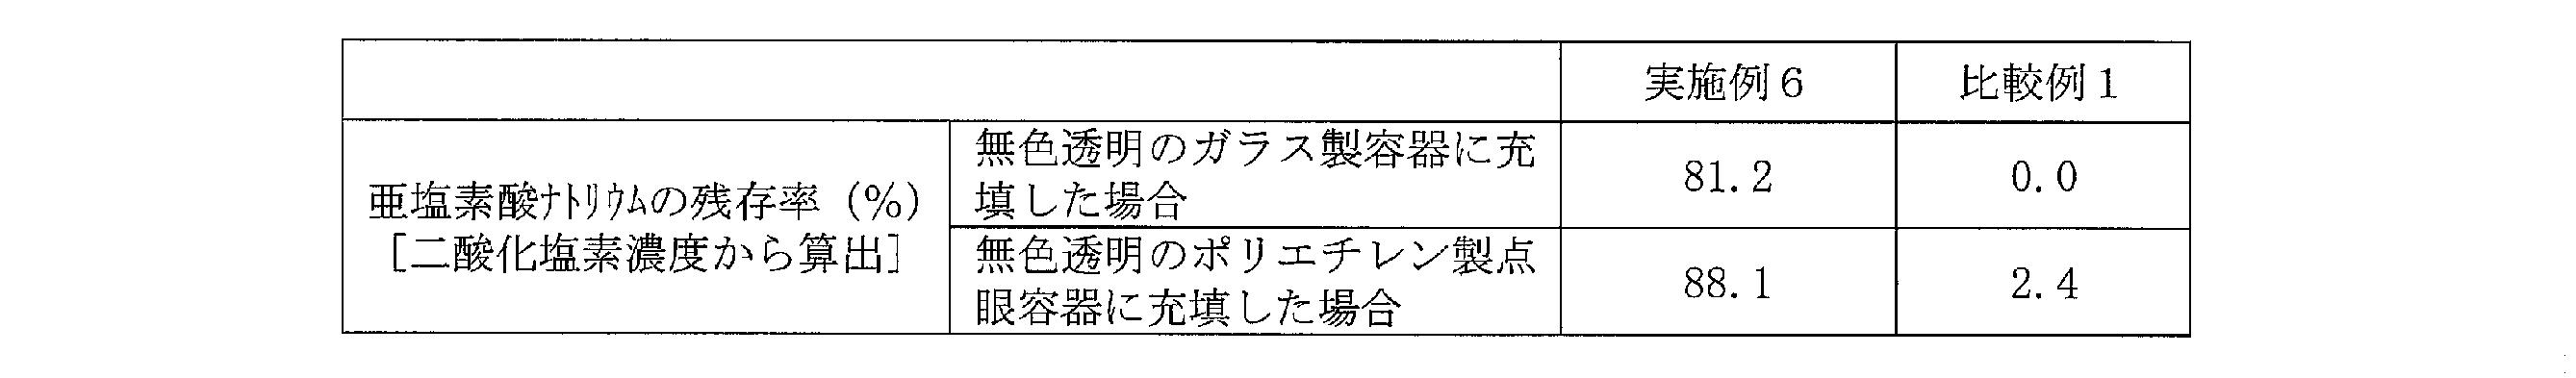 WO2013047373A1 - 亜塩素酸塩を含有する水性製剤         - Google PatentsFamily